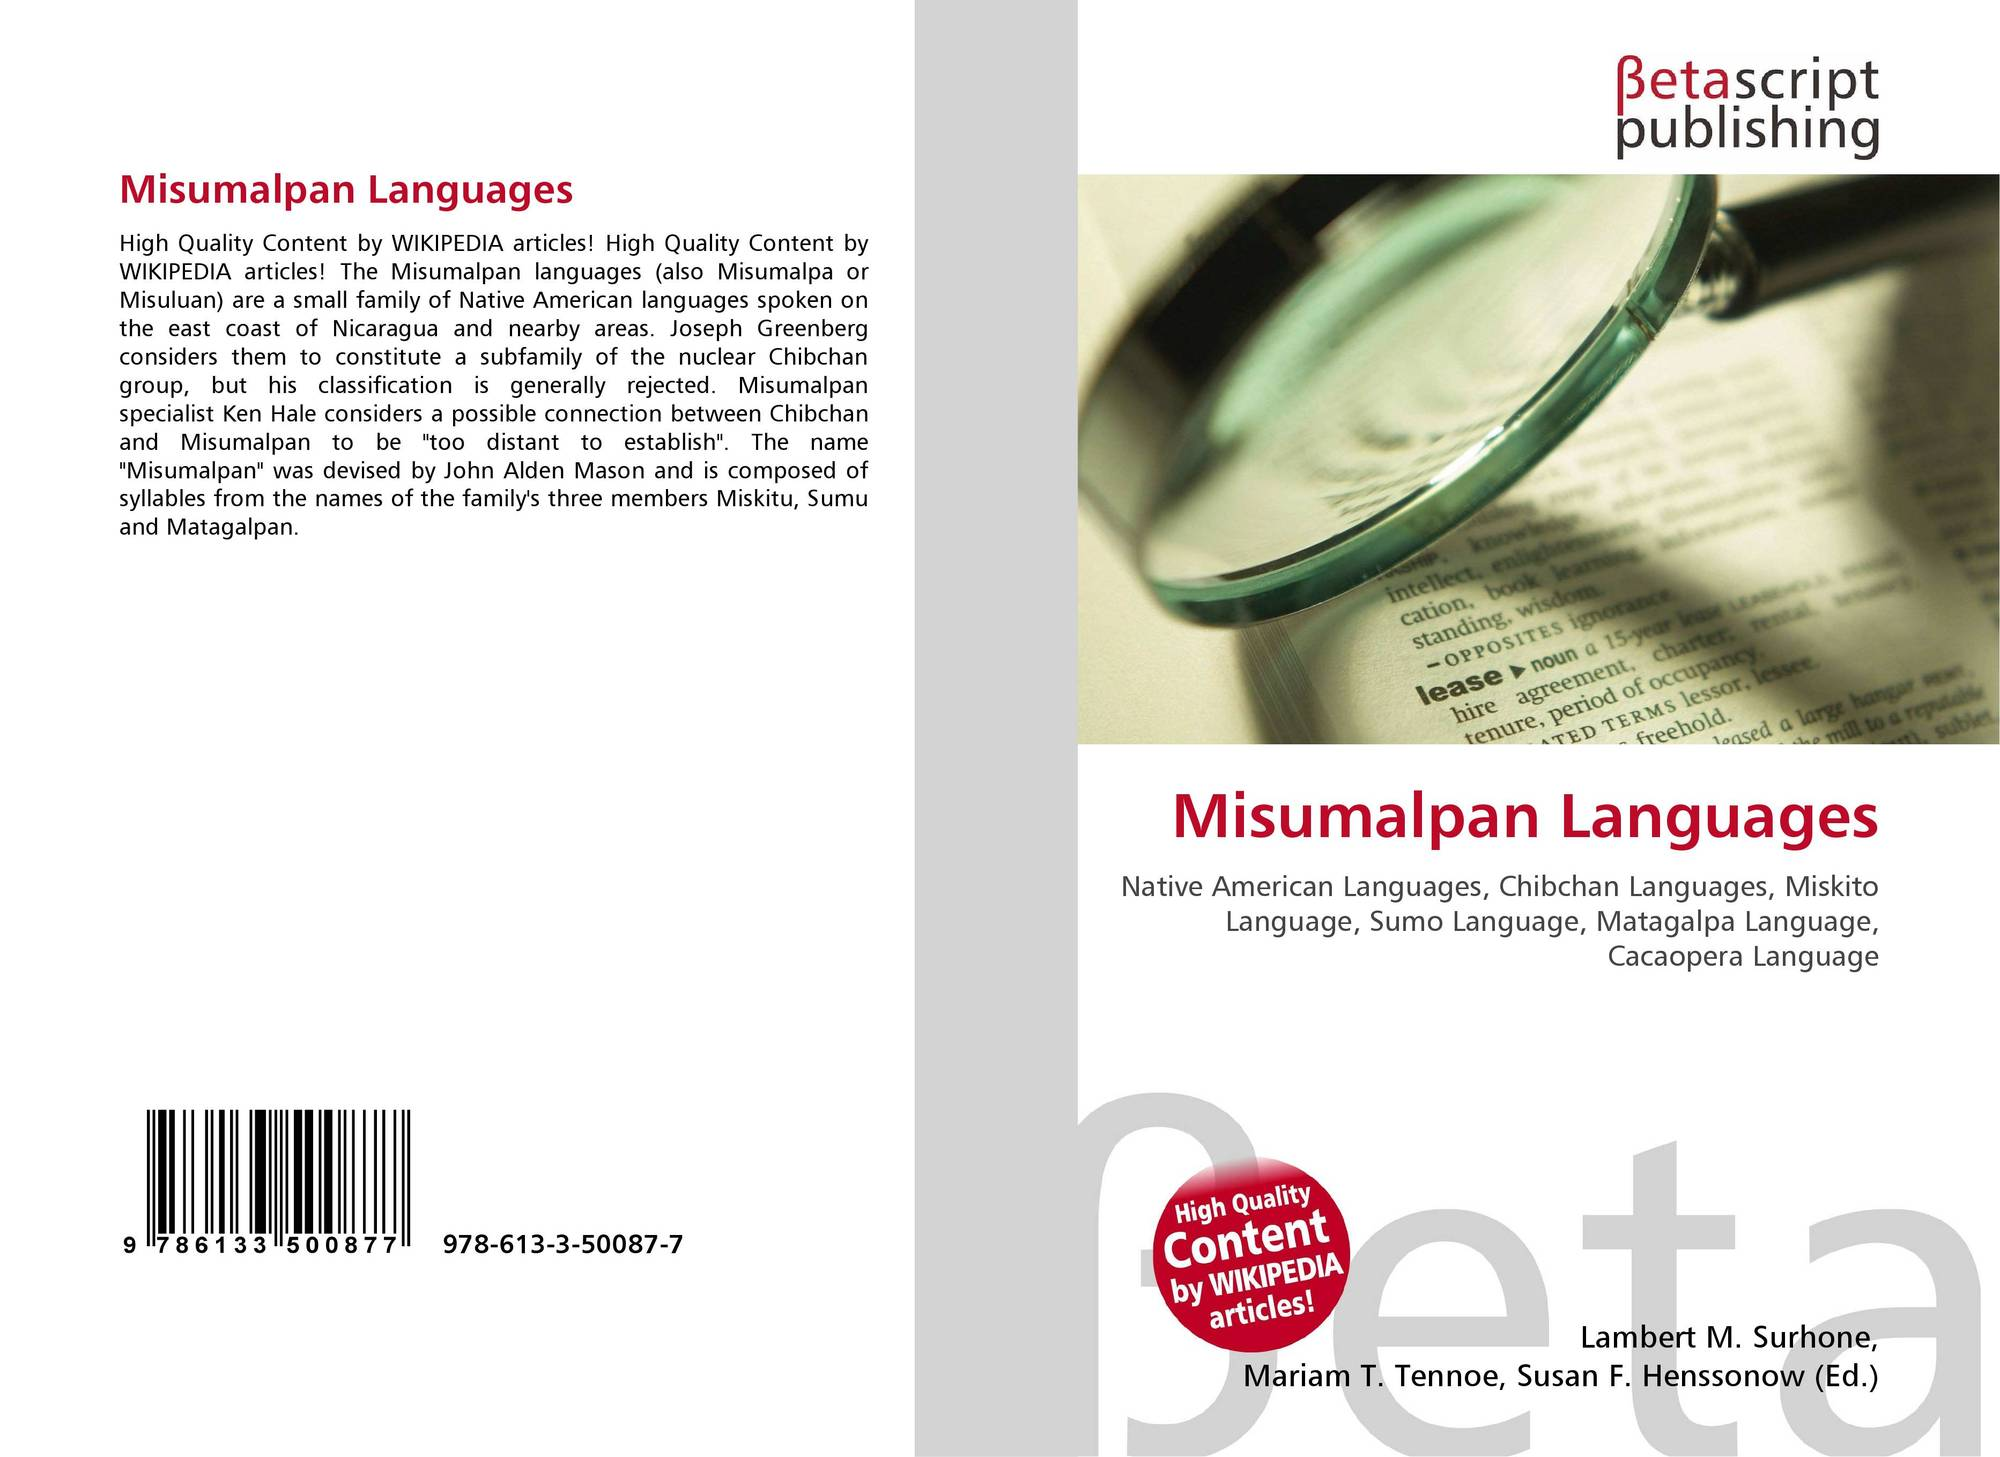 origins of vernacular language and its spread